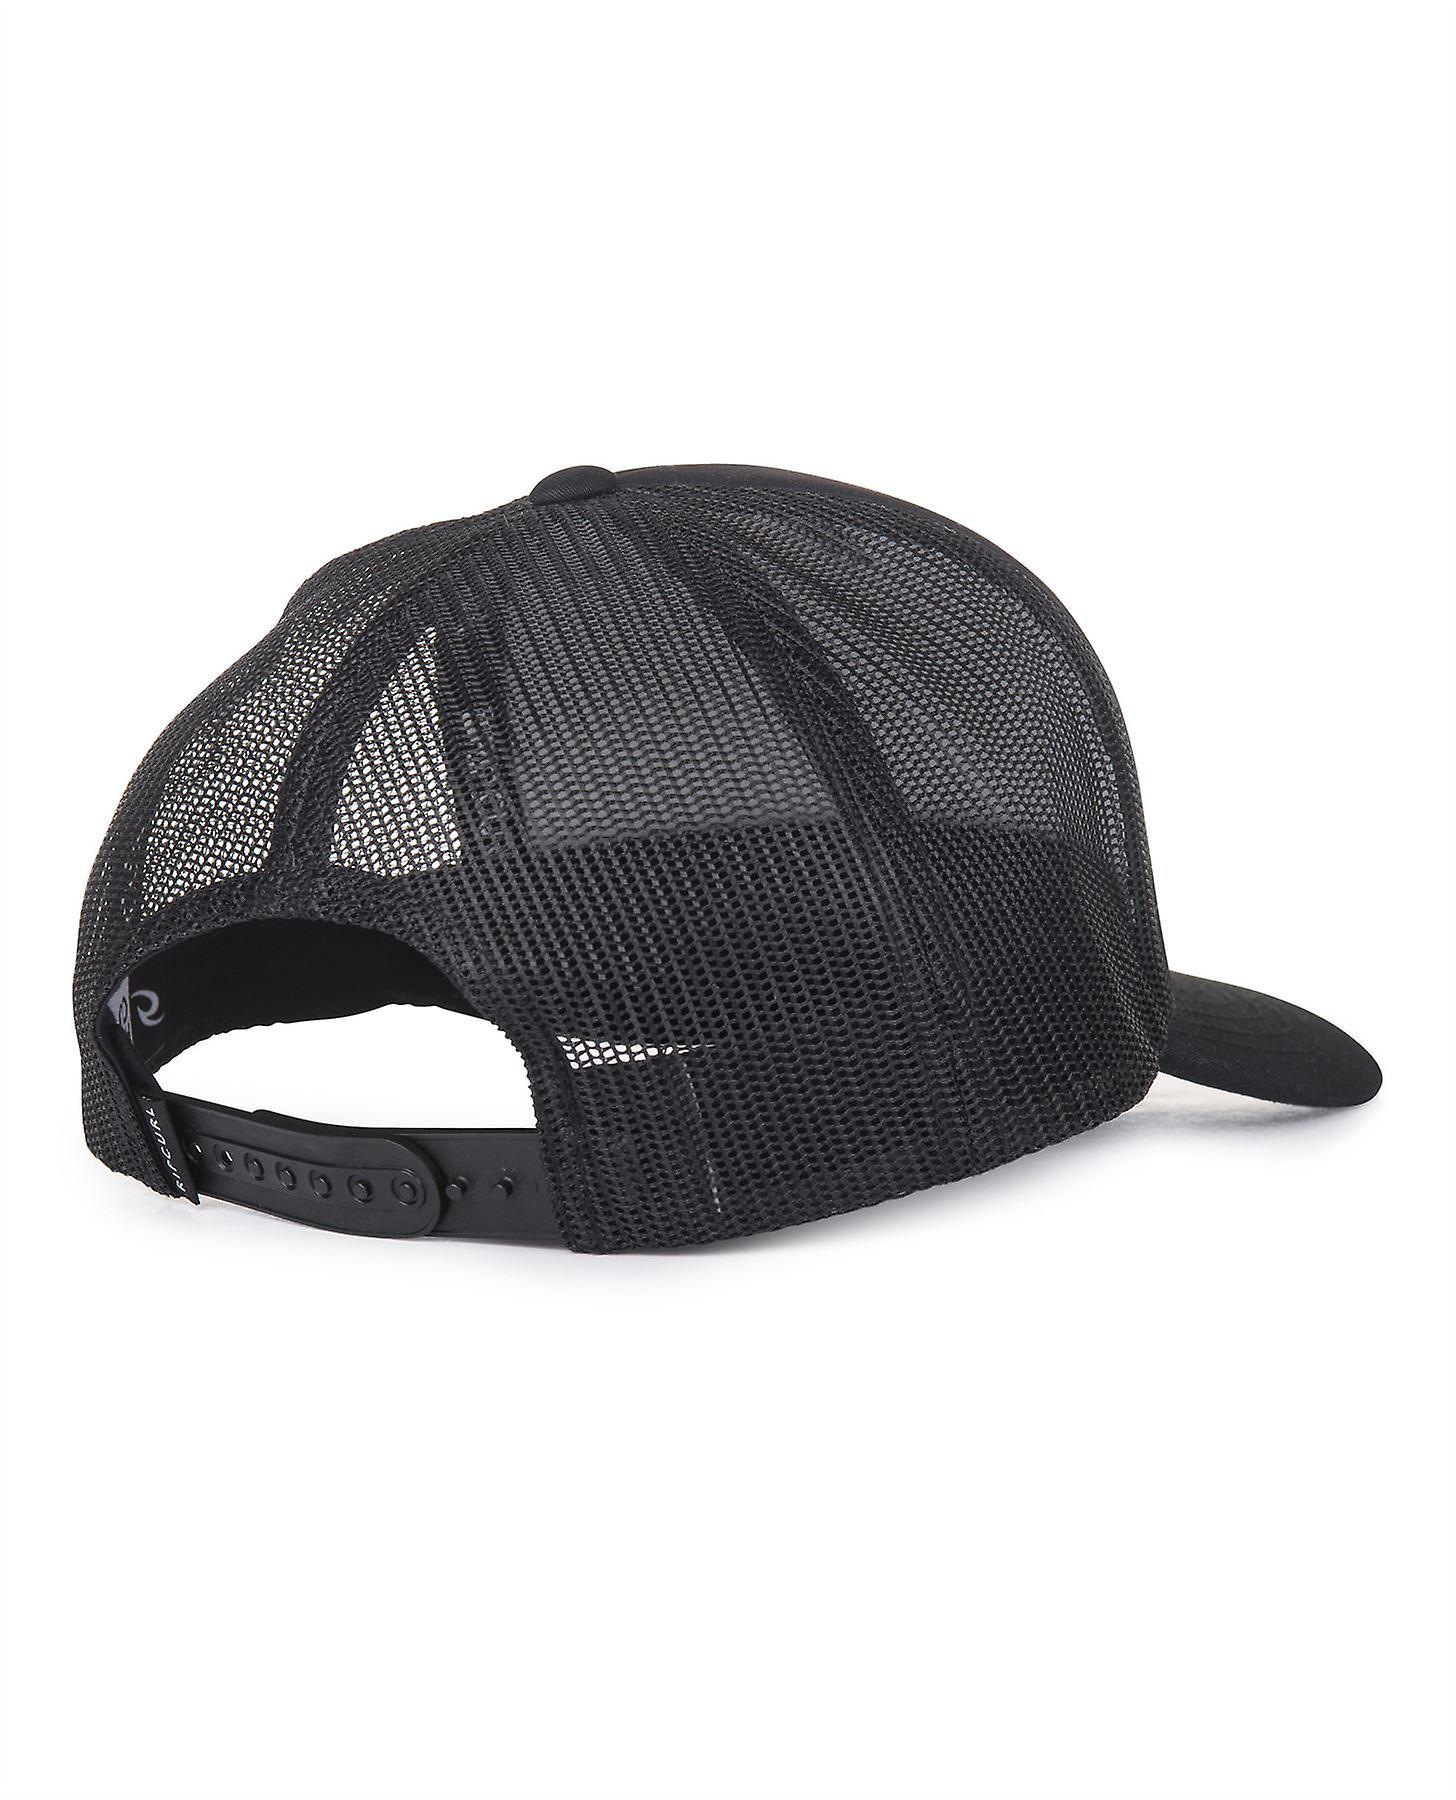 Rip Curl Trucker Snapback Cap ~ Back To The black